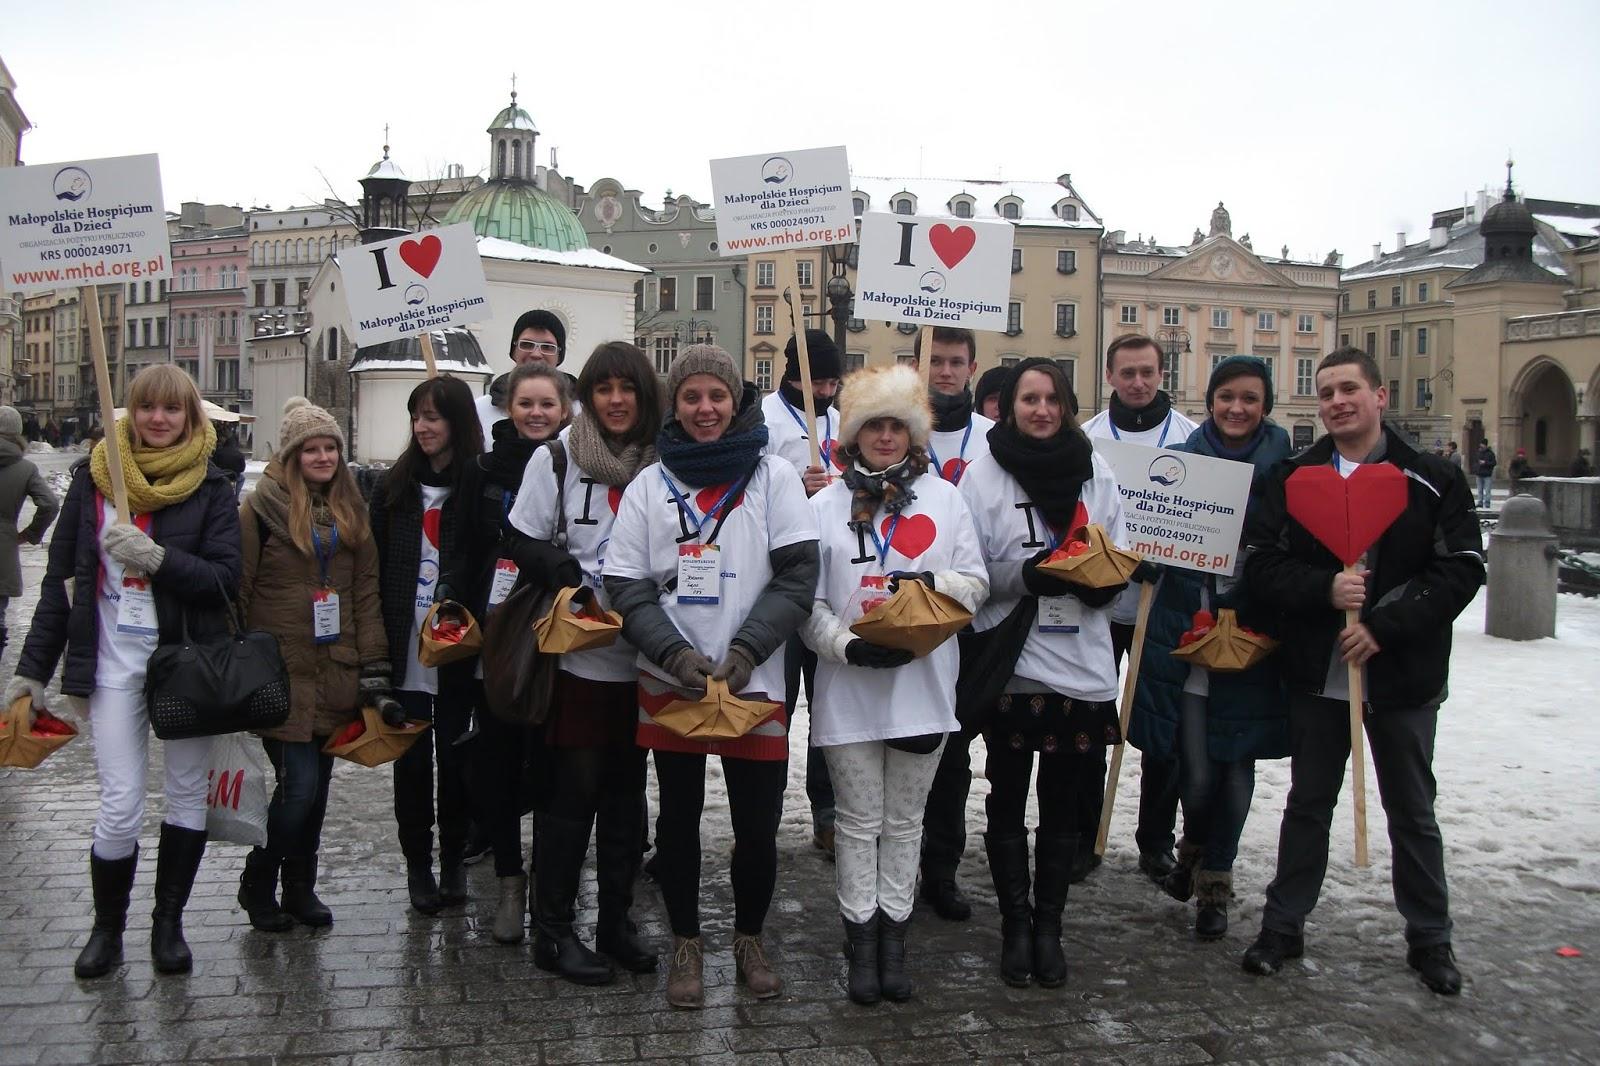 Serce od Hospicjum ! 14.02.2013 w Krakowie